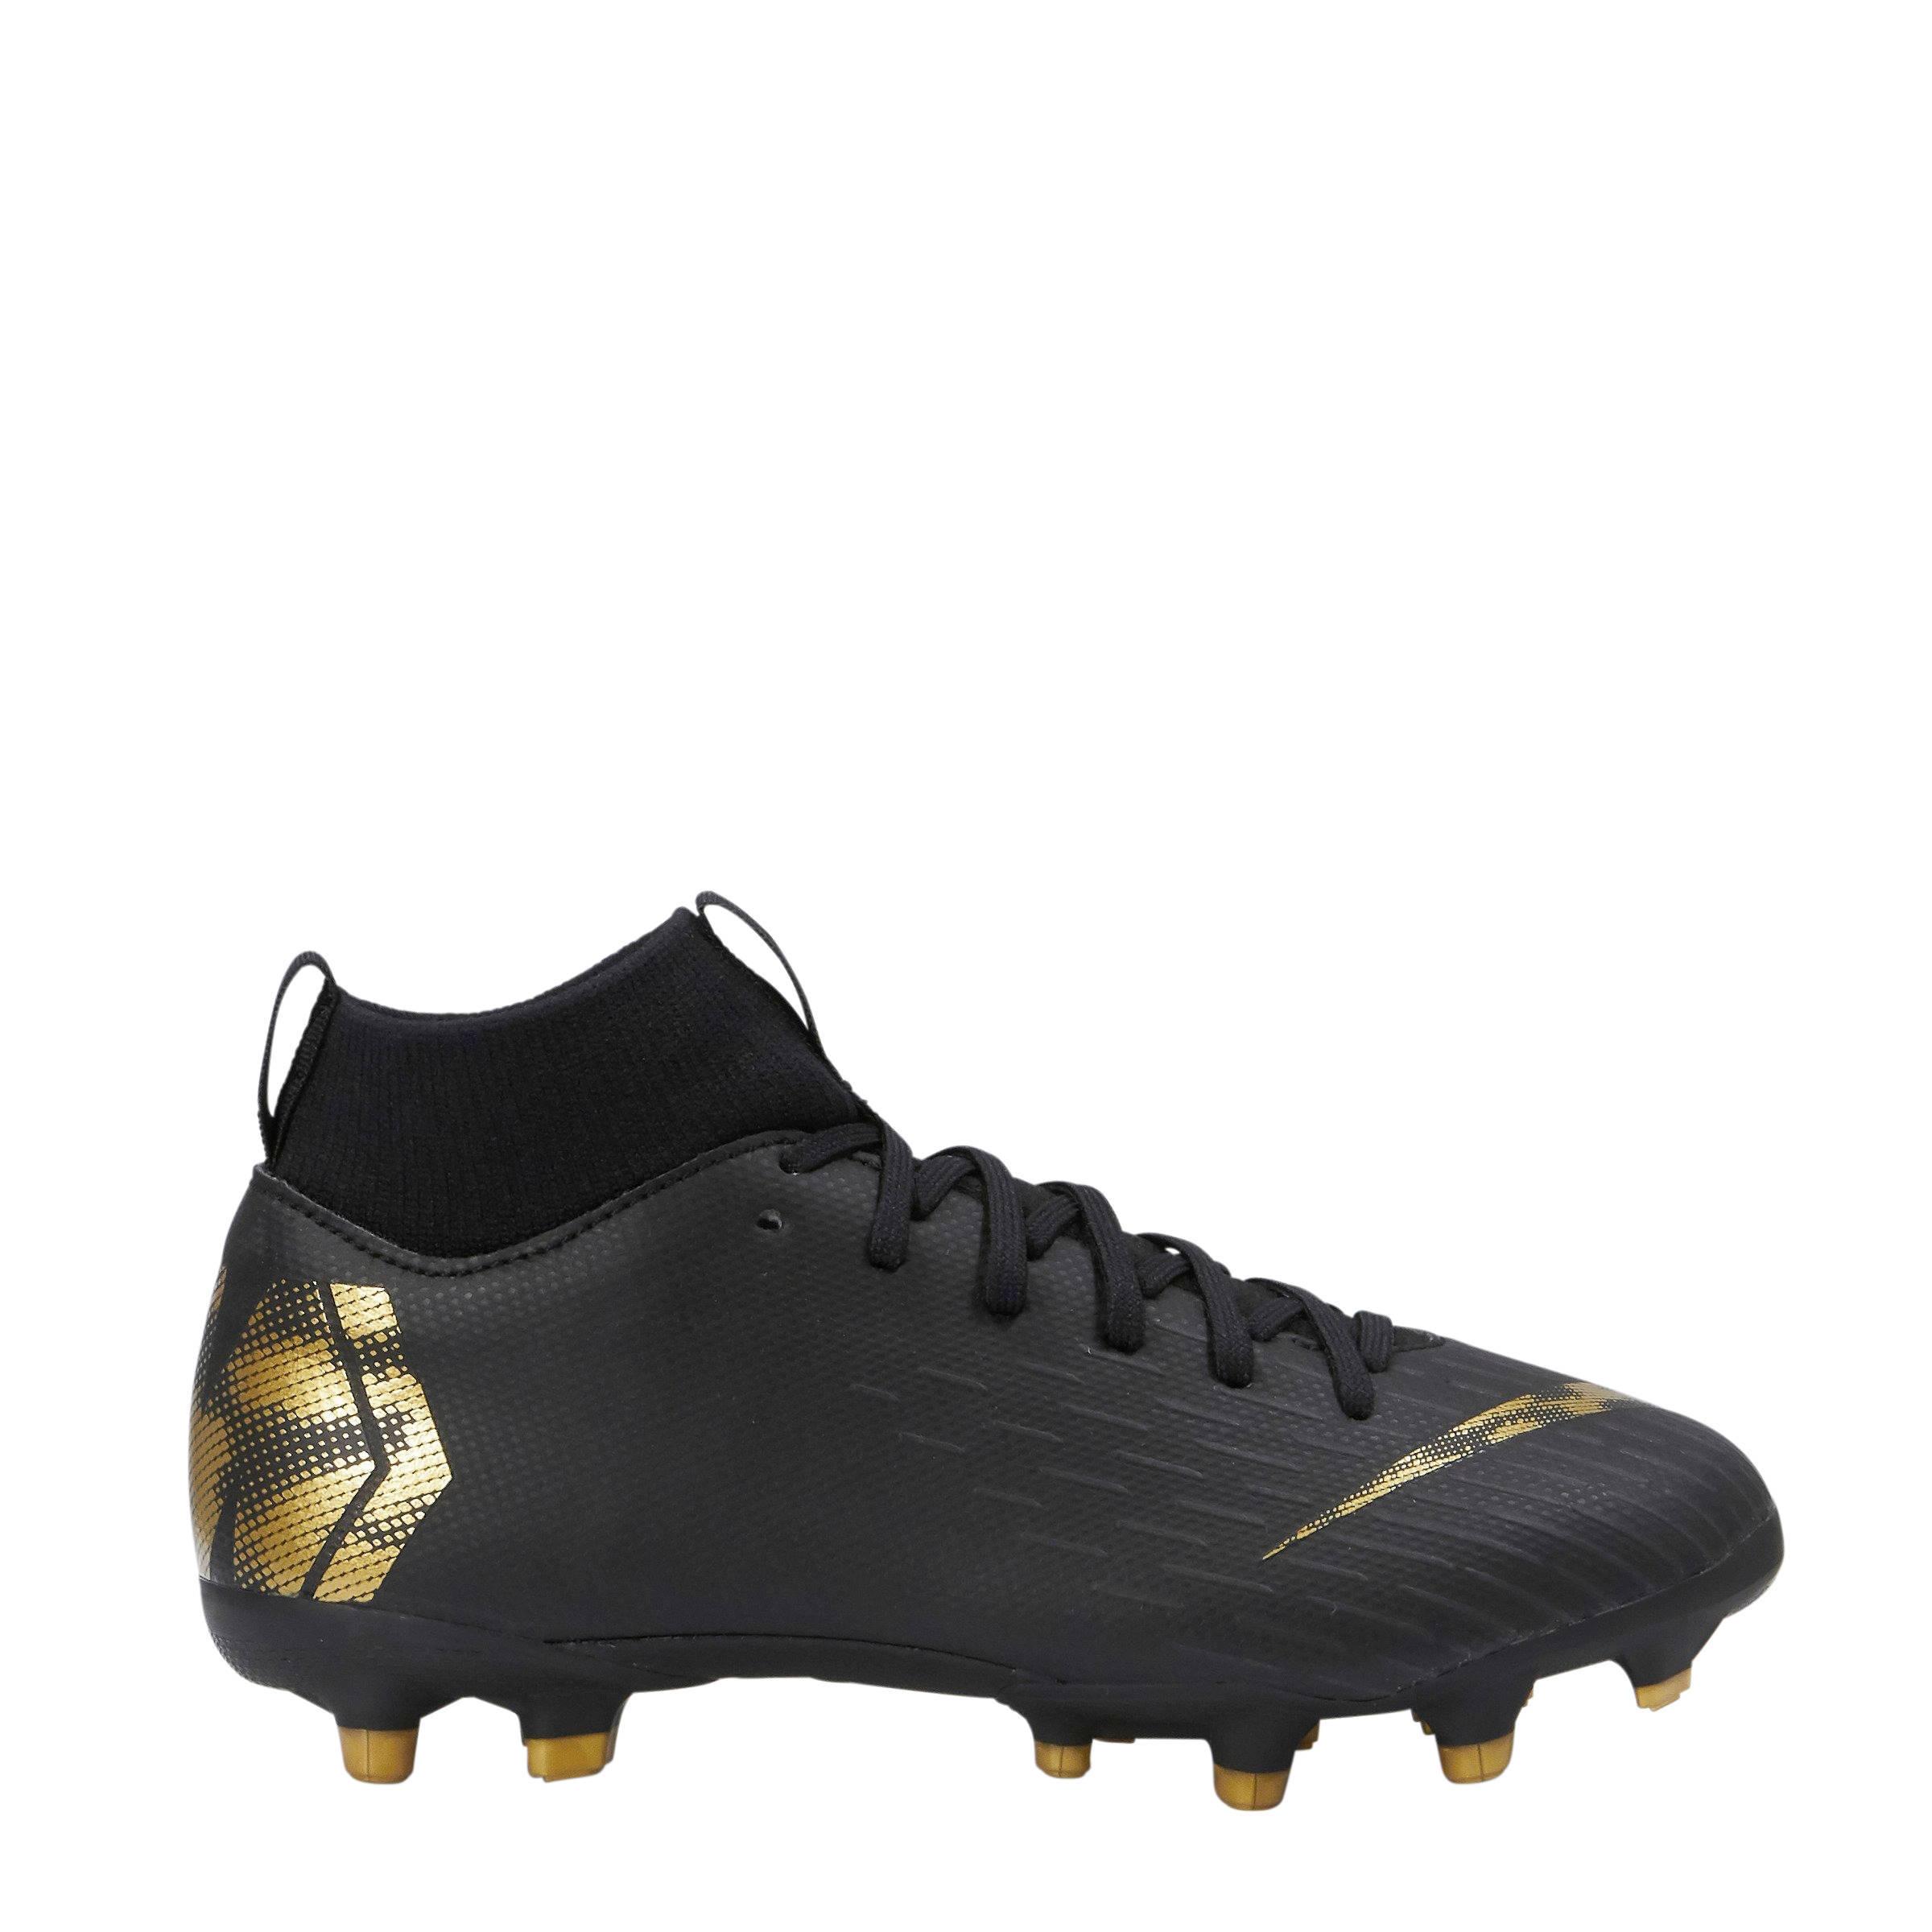 info for b47c0 dce15 Nike Mercurial Superfly 6 Academy GS MG voetbalschoenen   wehkamp